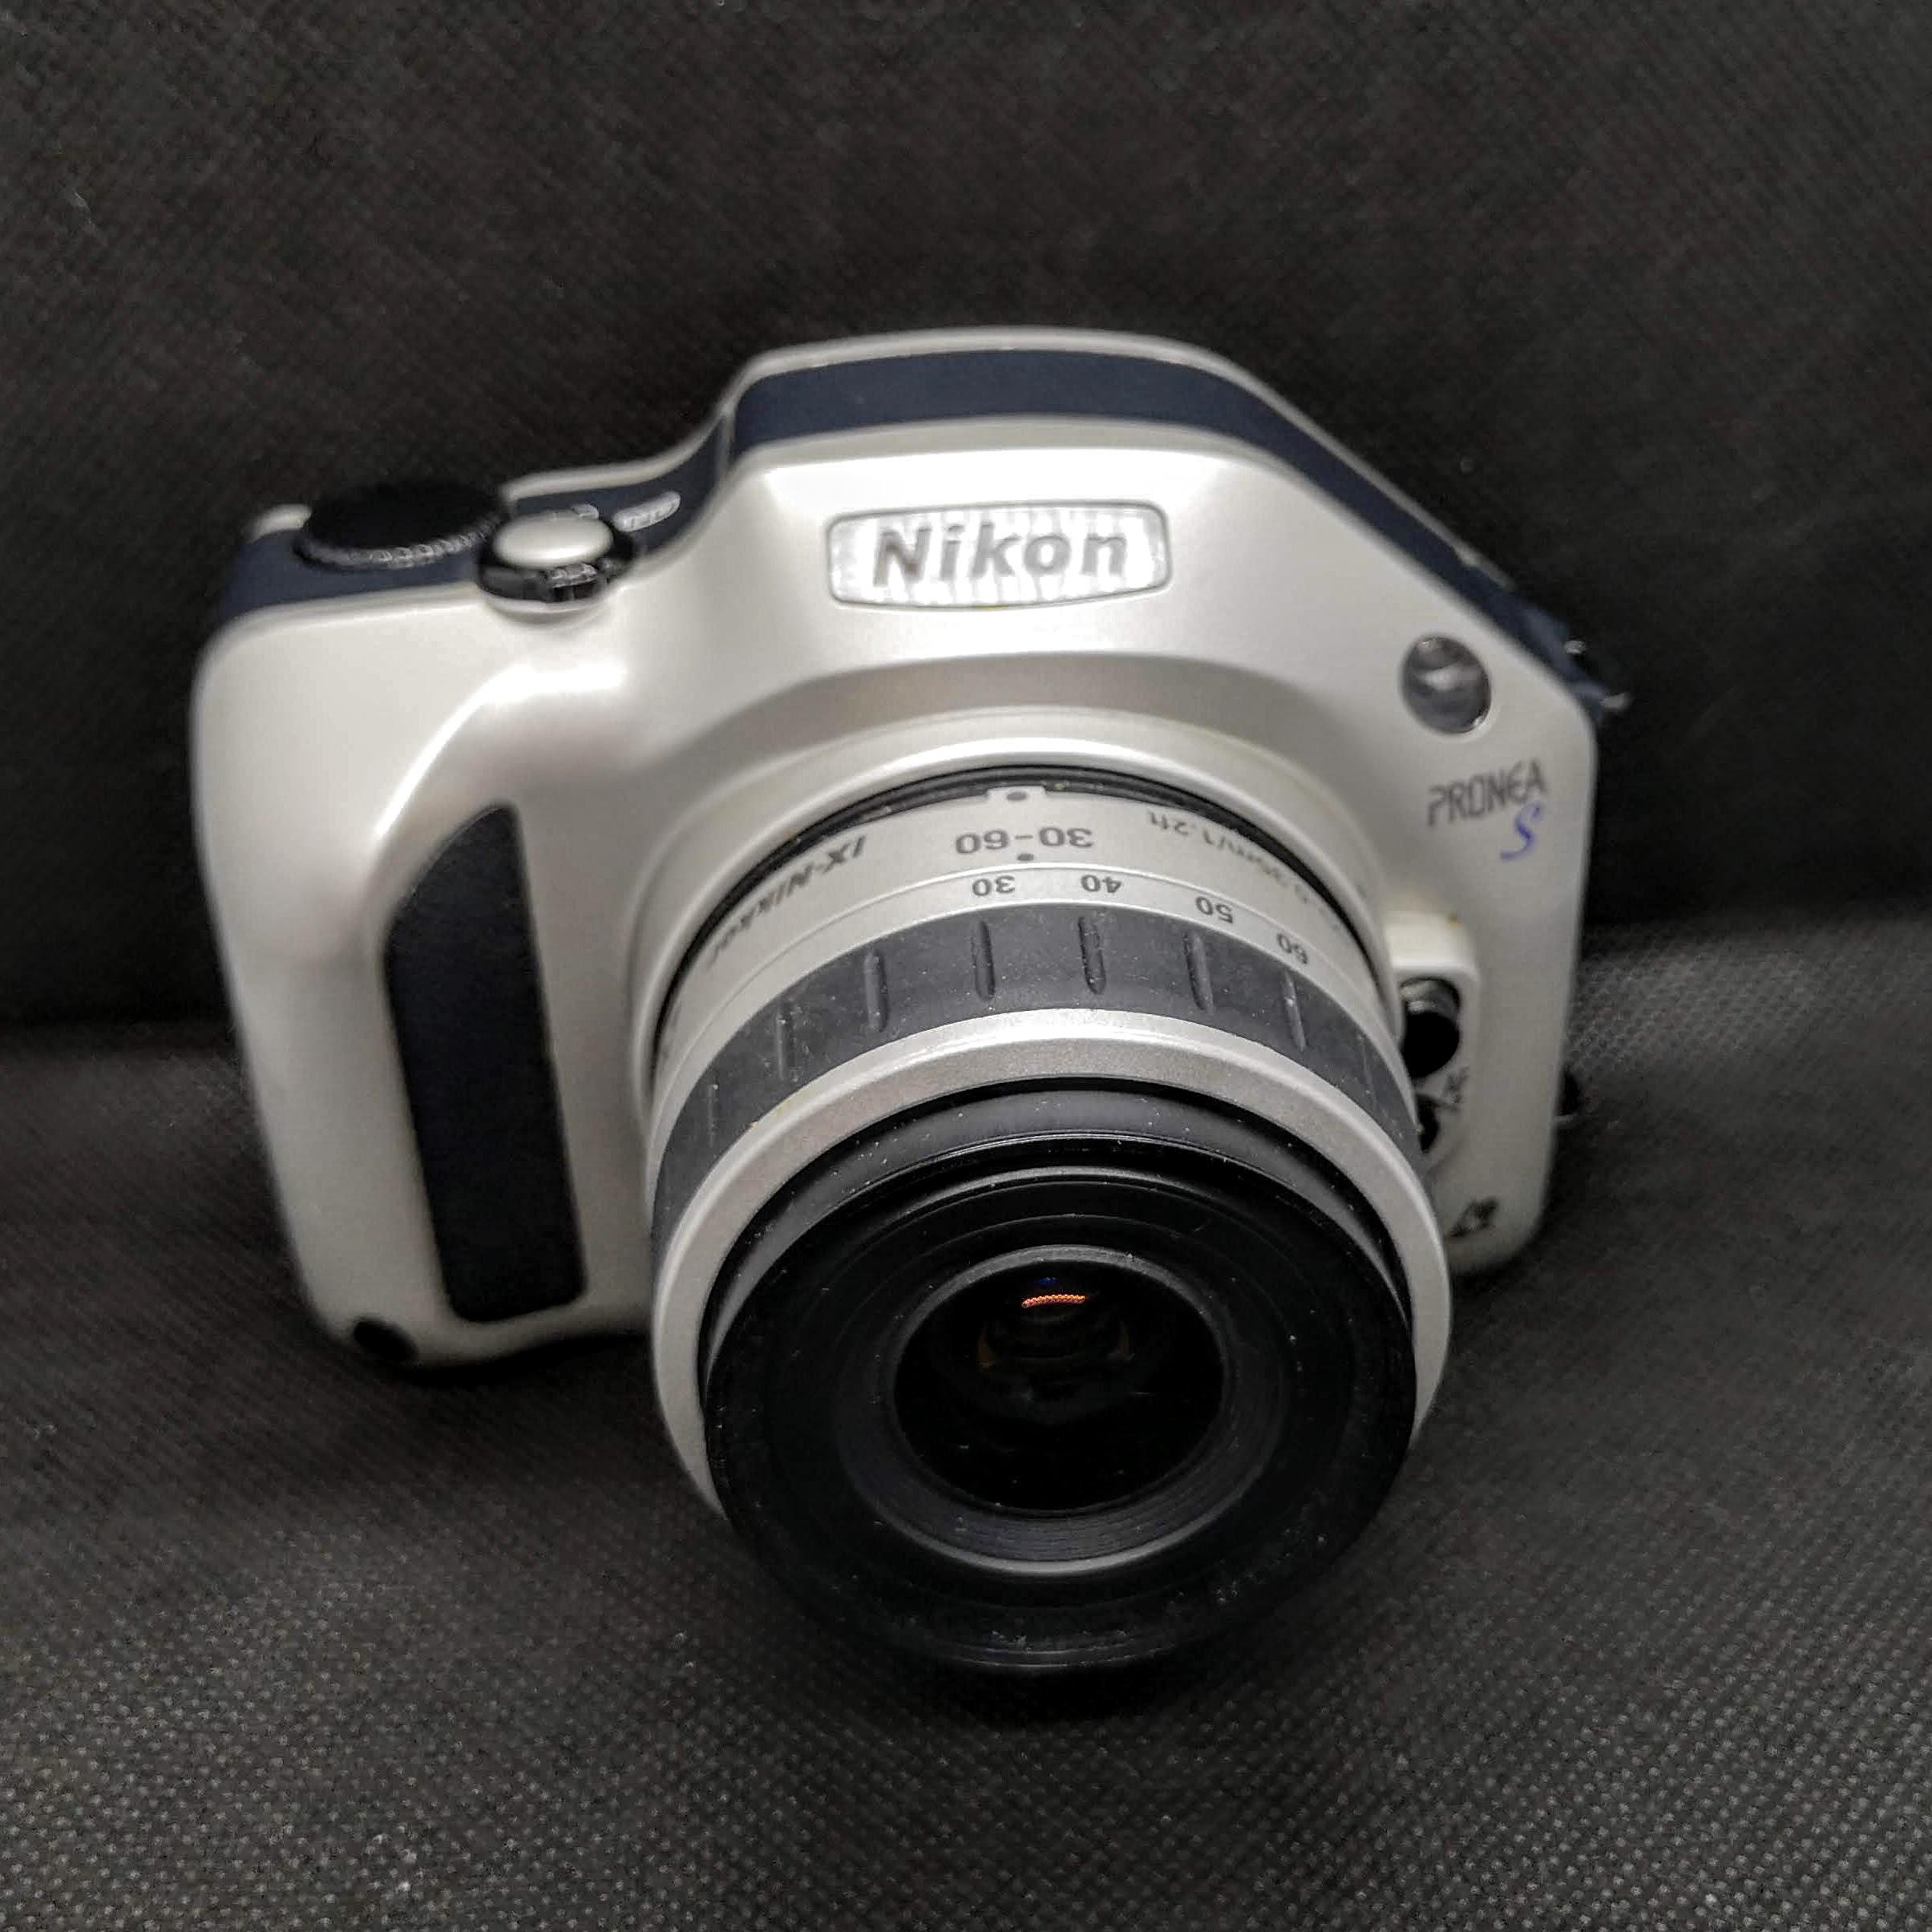 Nikon Pronea S with 30-60mm IX-Nikkor